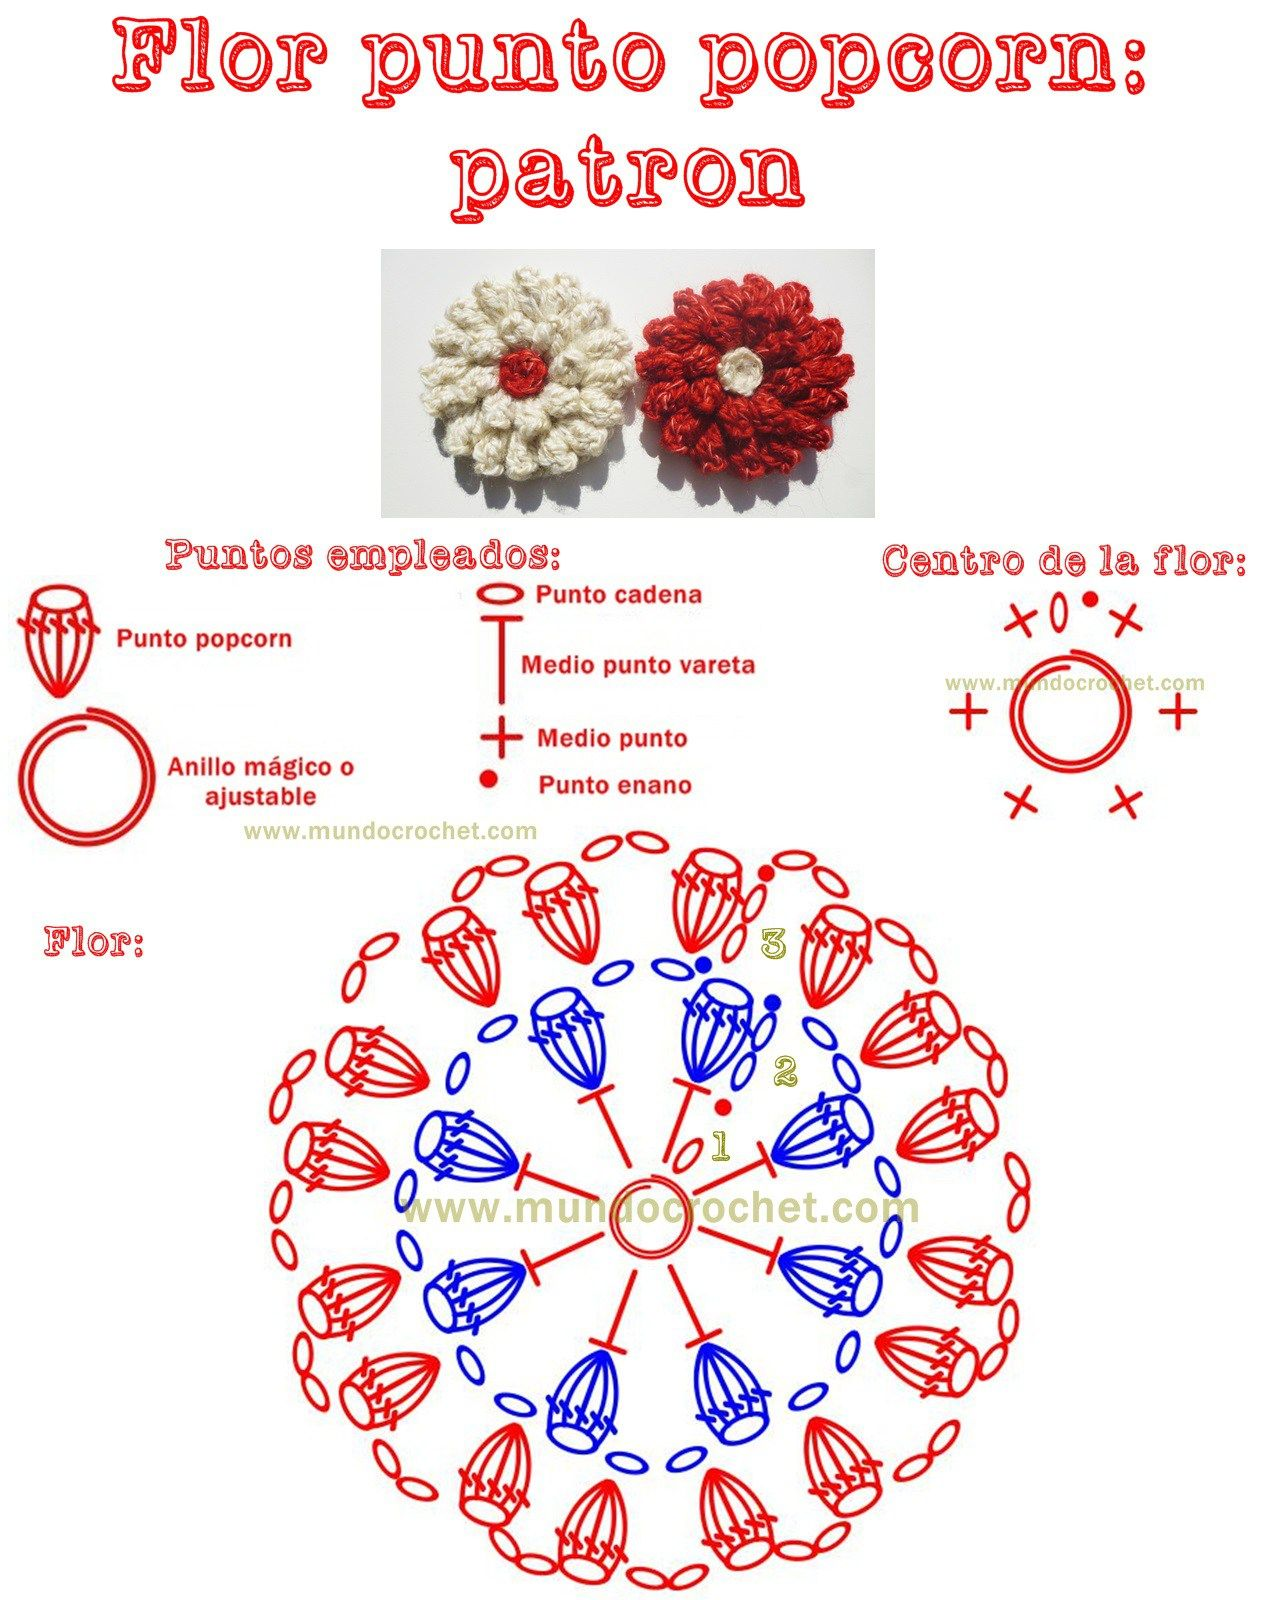 Patron flor en punto popcorn a crochet o ganchillo | ➽ Bunga Rajut ...